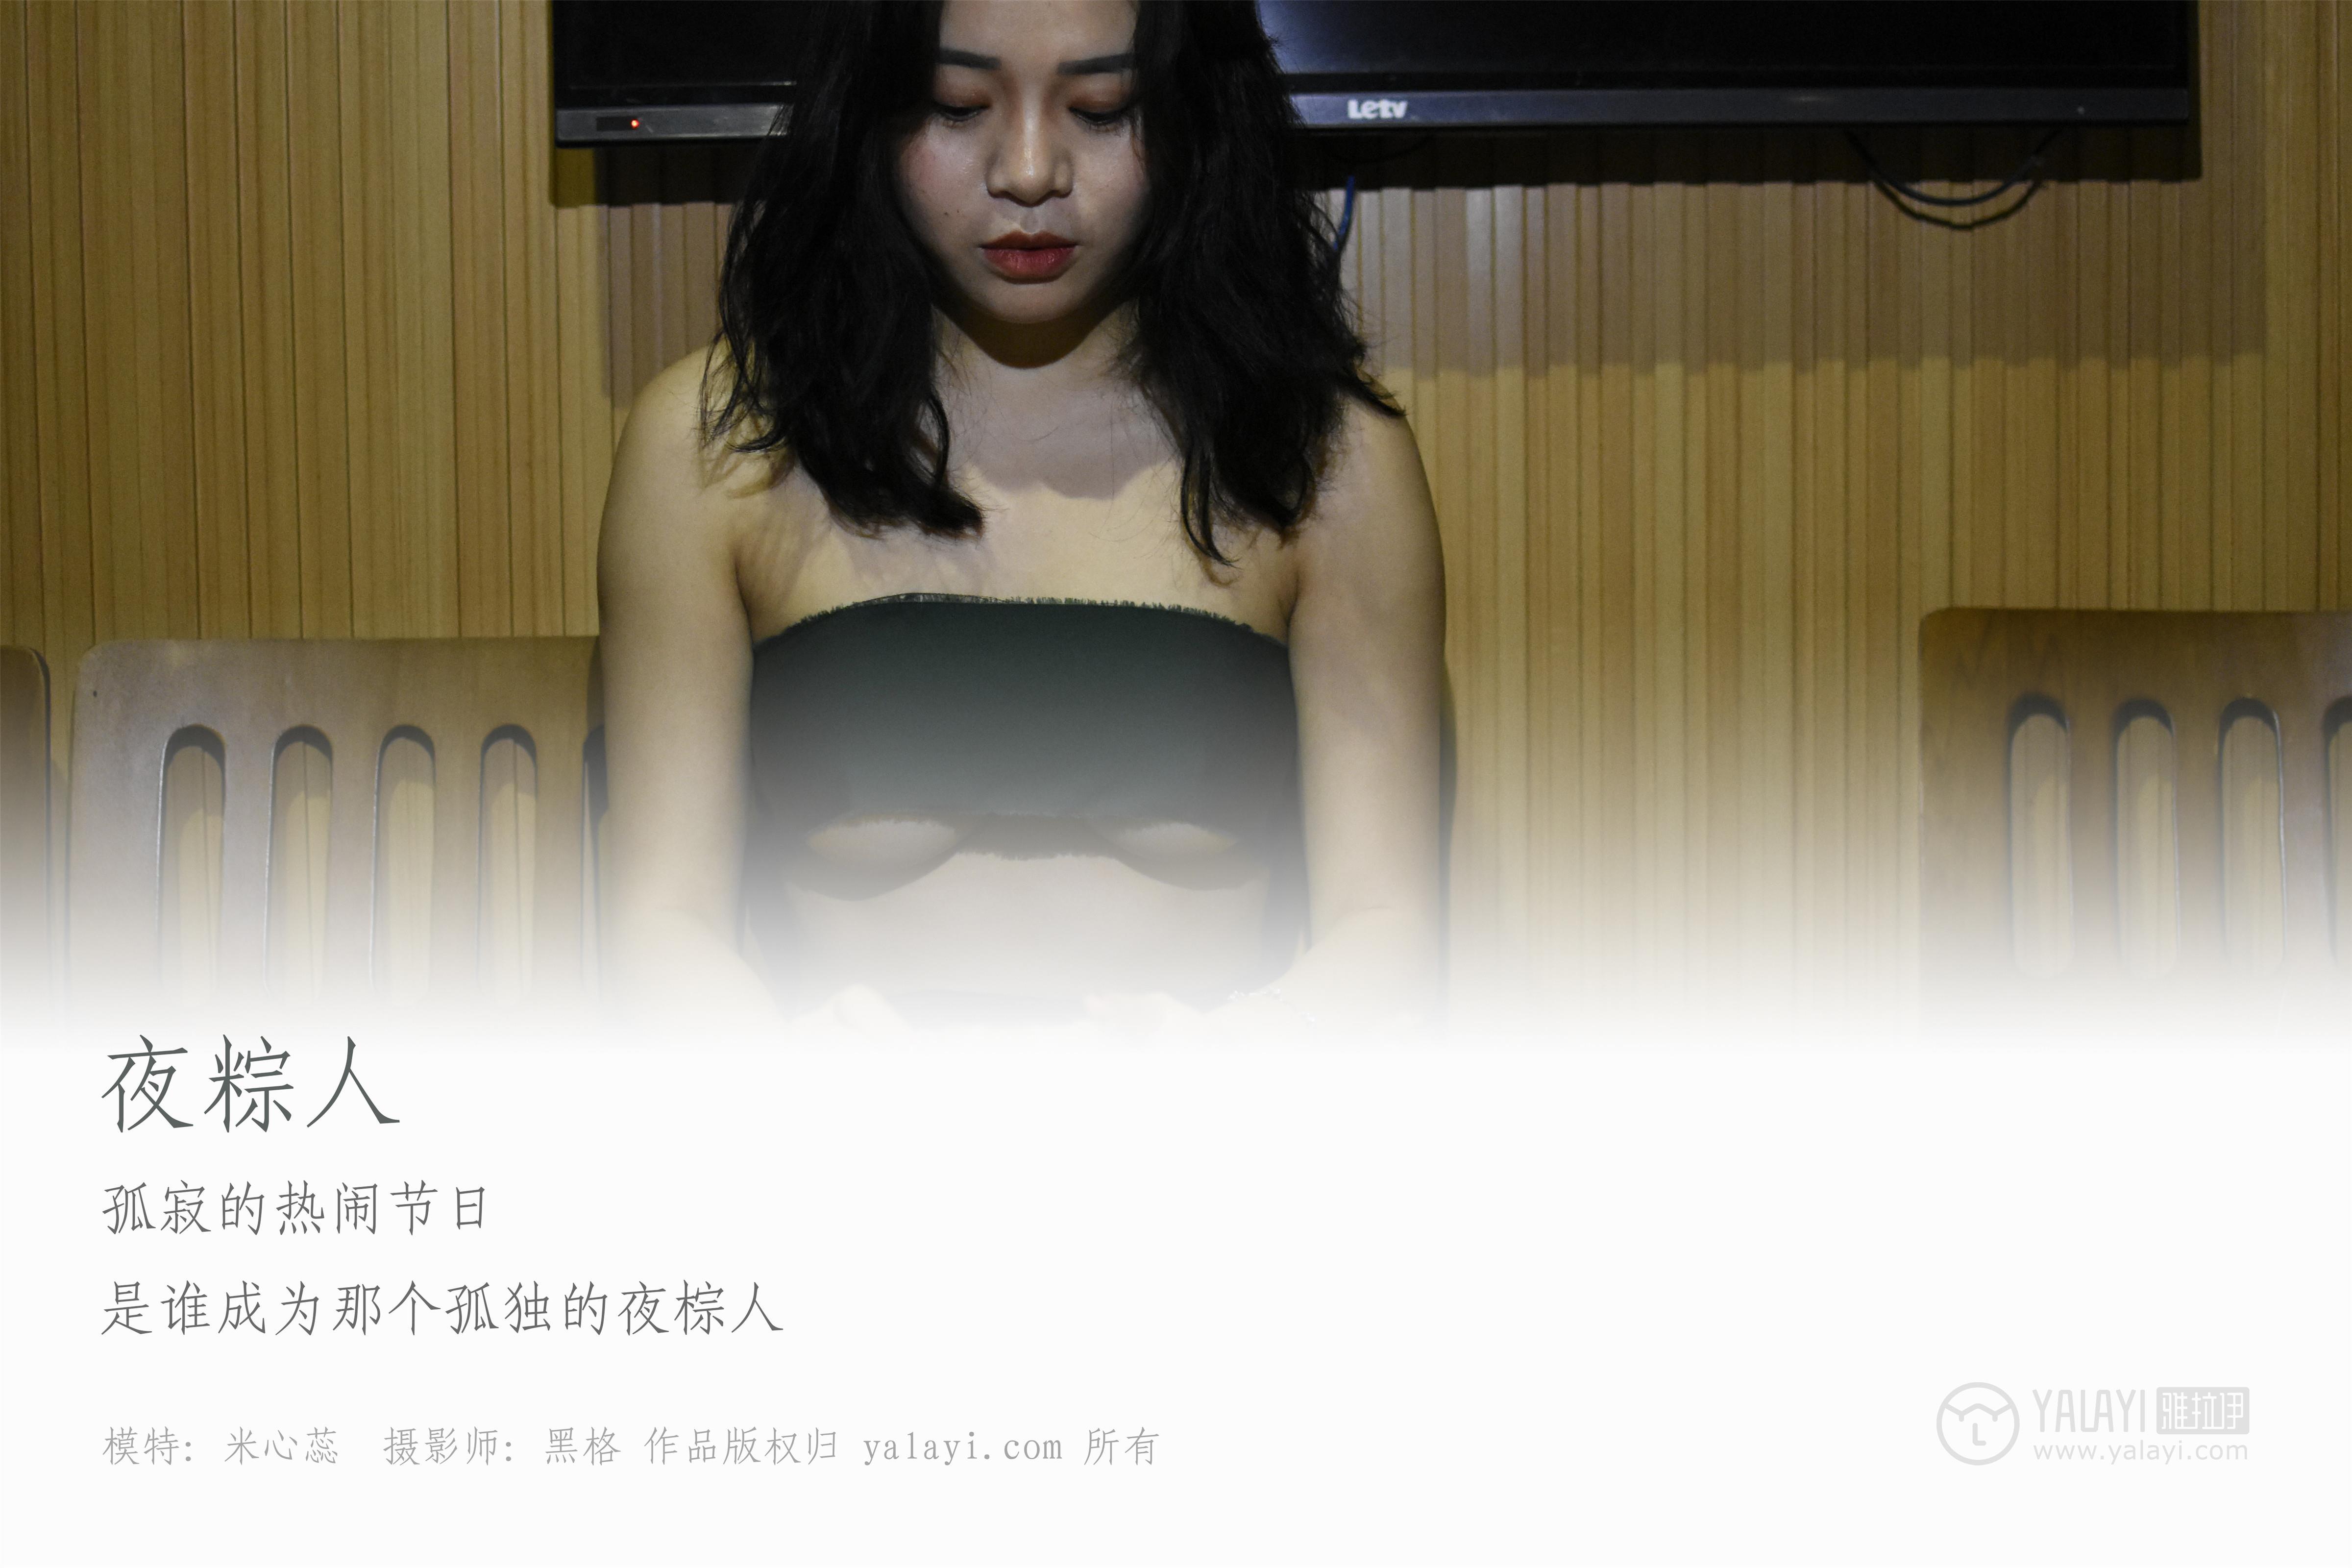 [YALAYI雅拉伊]NO.015 粽人 米心蕊 裹胸内衣加黑色丝袜美腿性感私房写真集